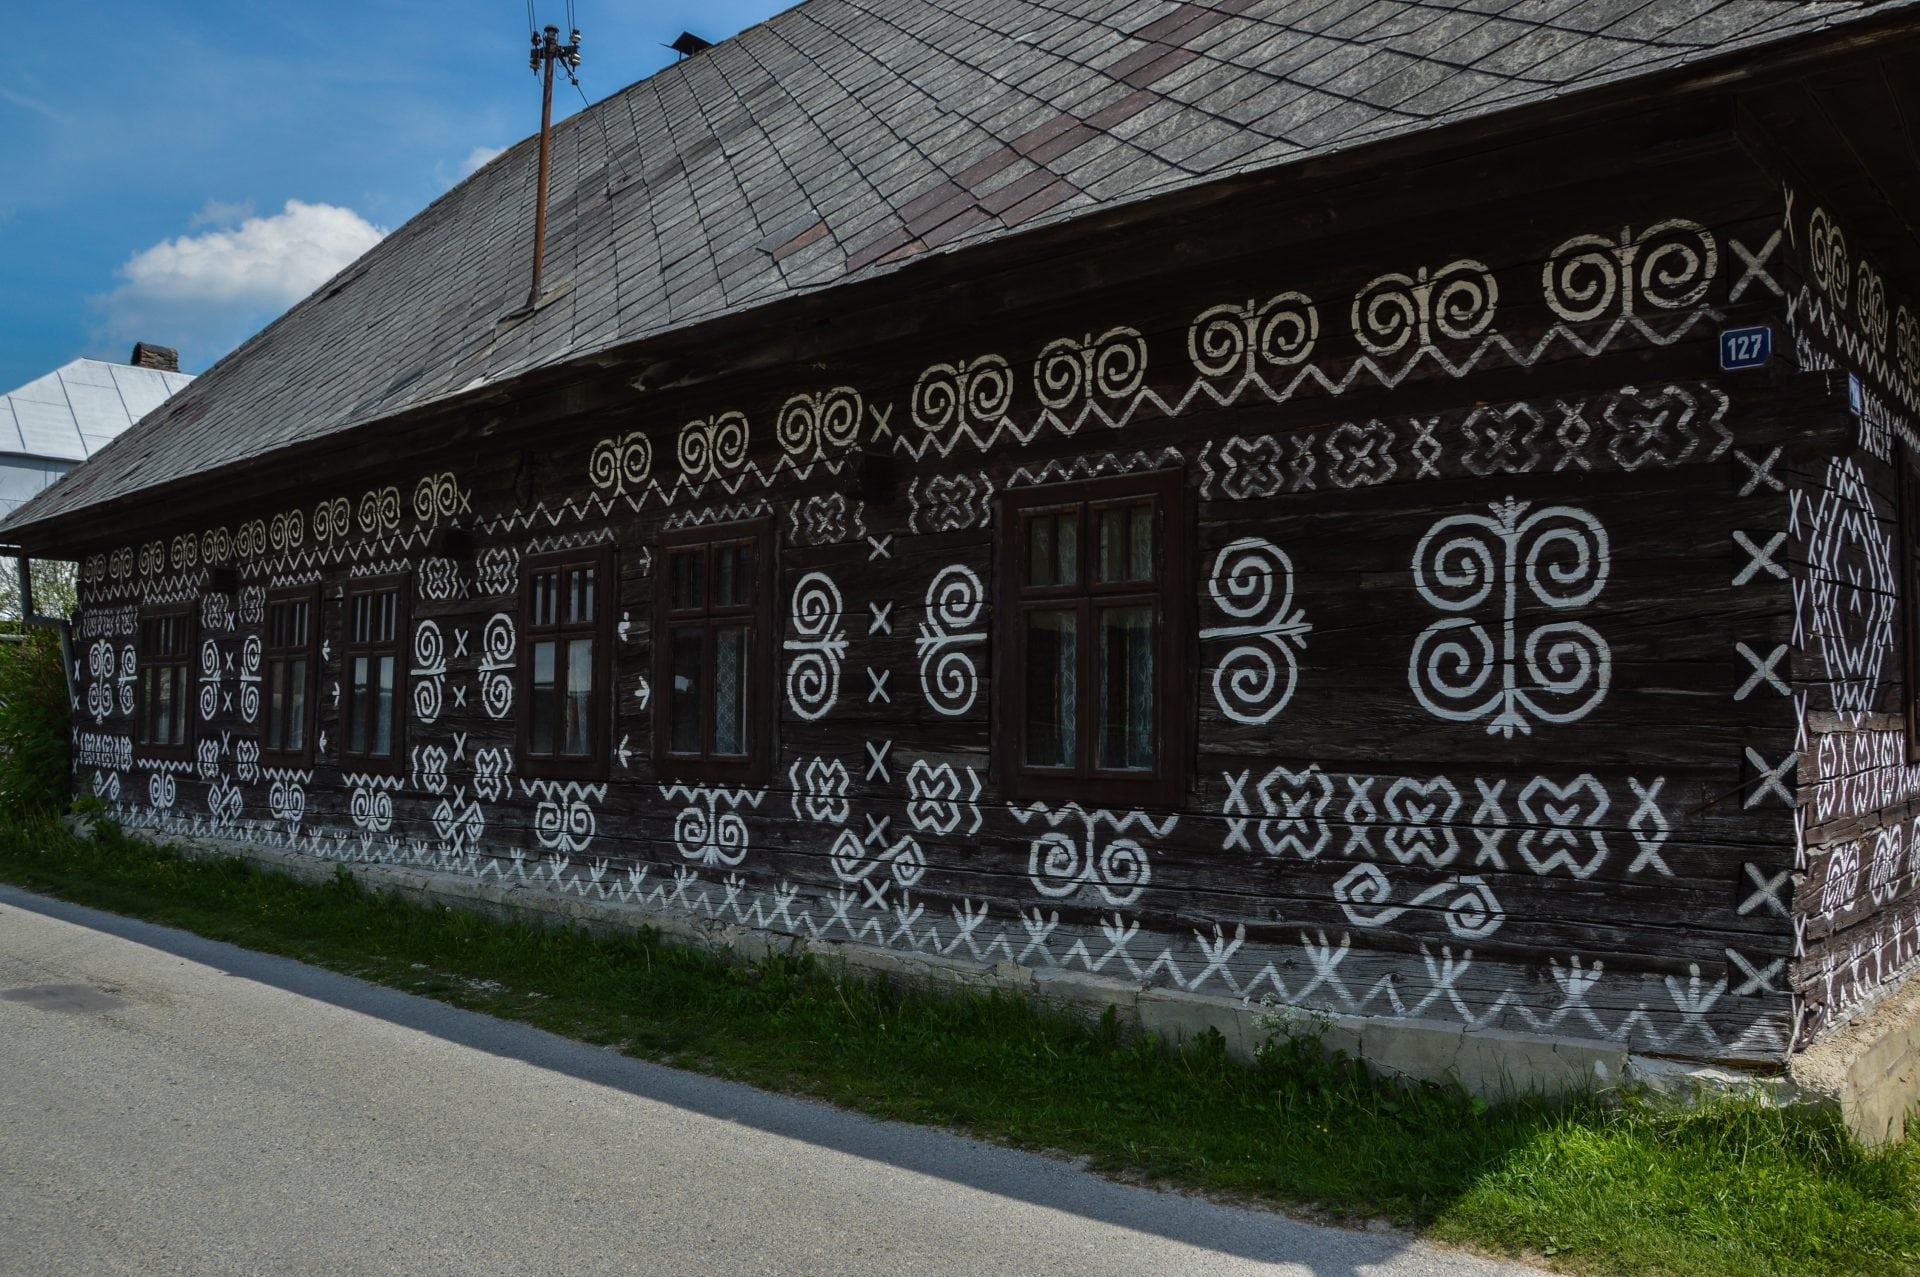 malovany-dom-biele-vapno-lomena-vlnovka-trojcipy-listok-lezaty-kriz-drevo-dom-okno-strecha